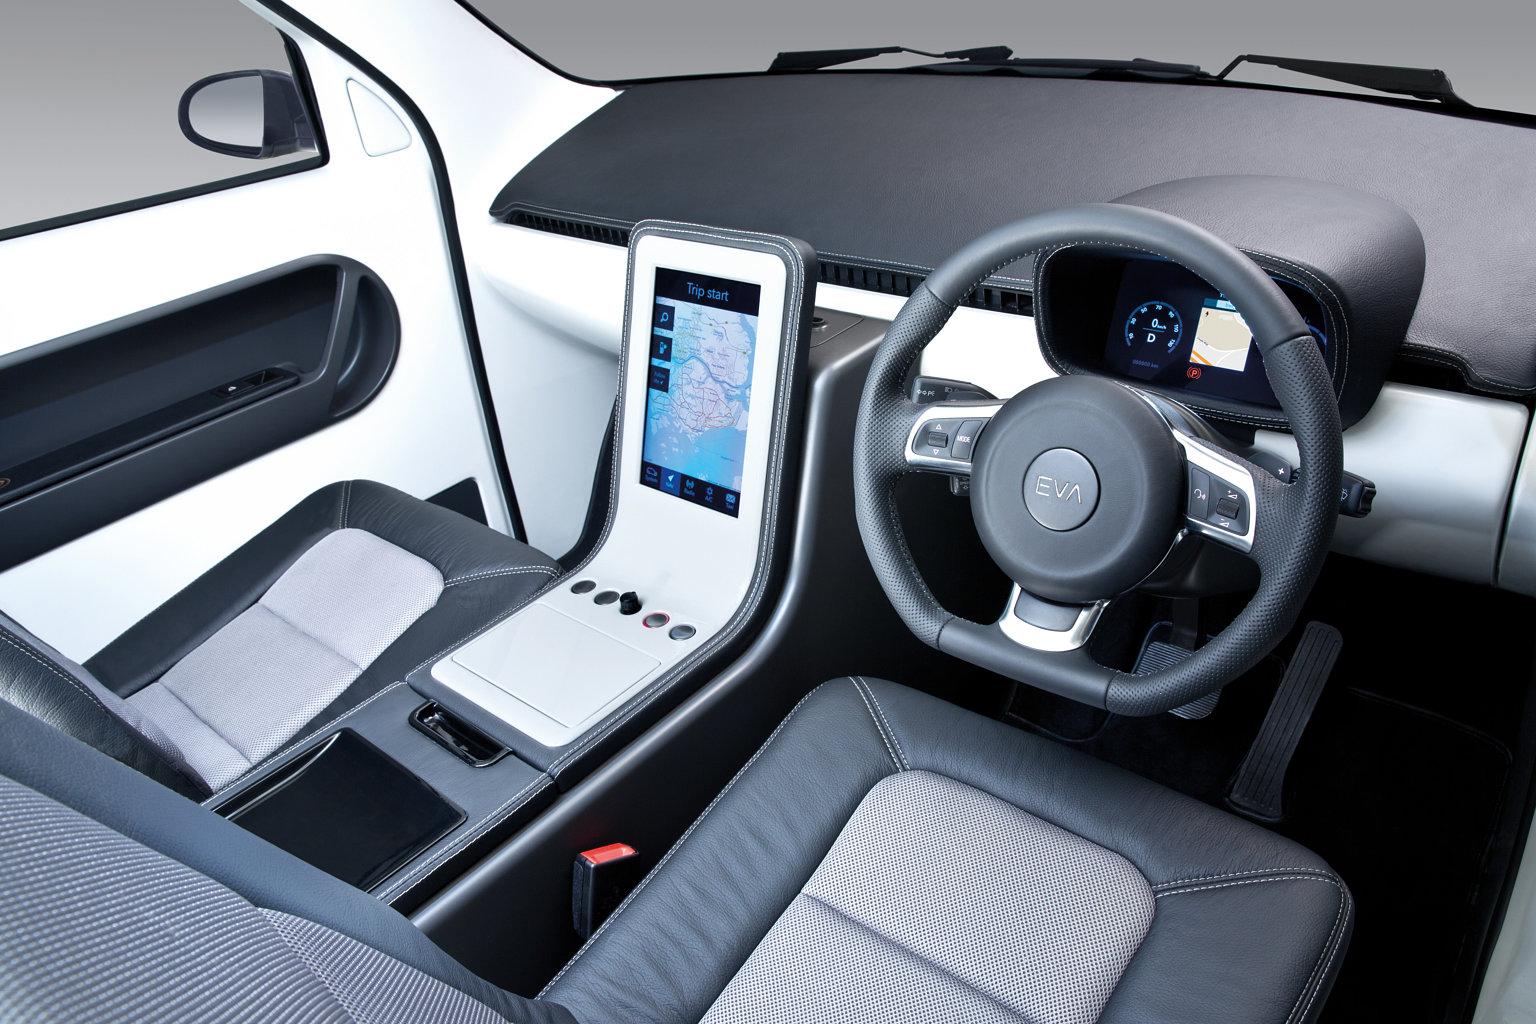 EVA studio interior driver